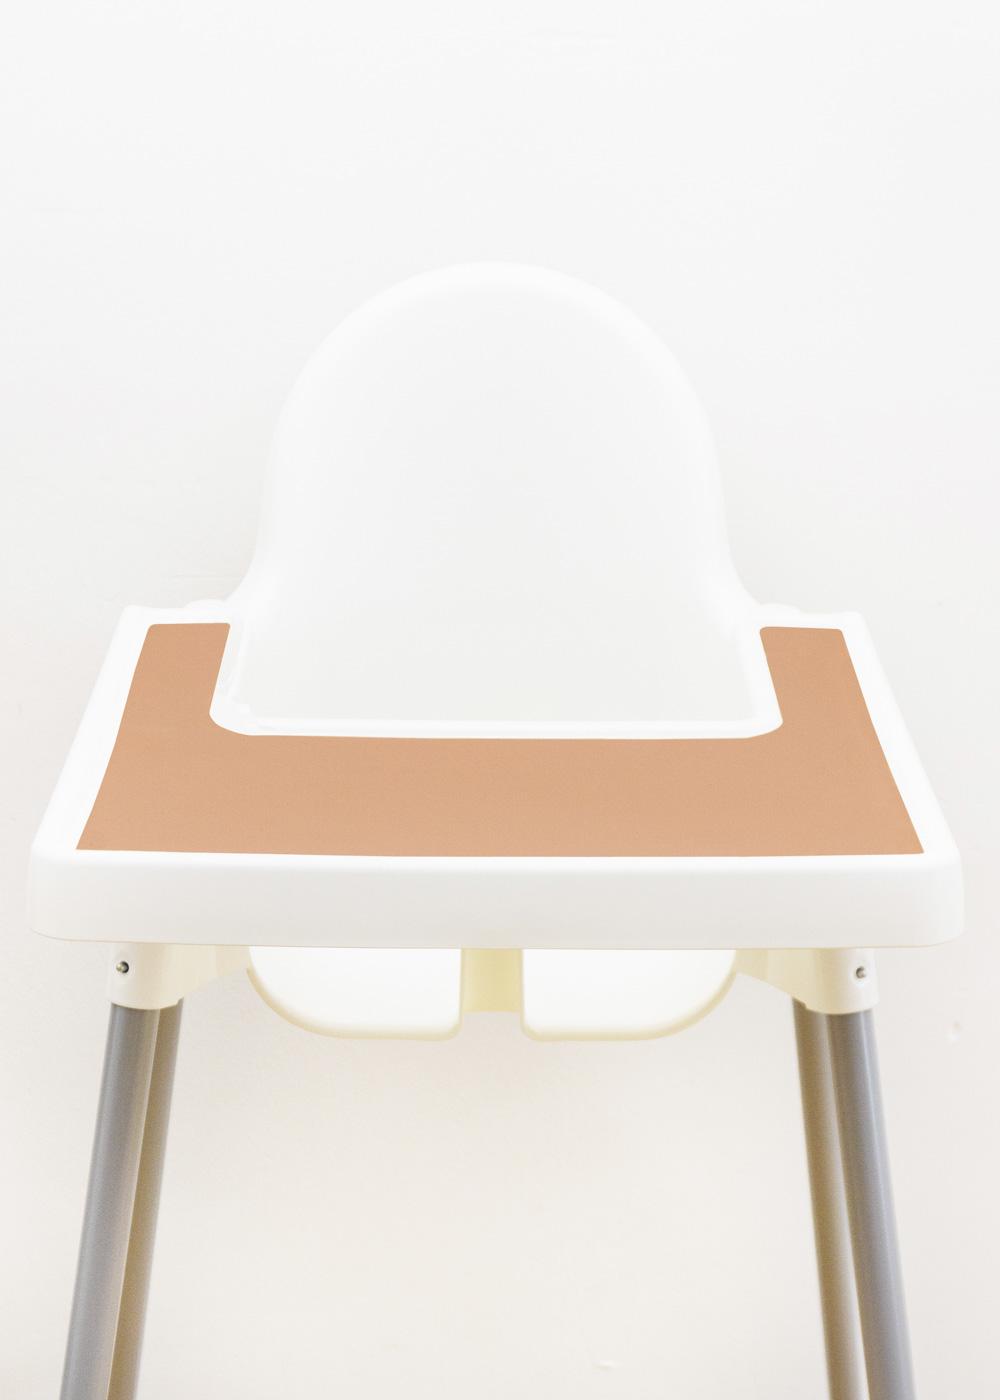 Silikonmatte Ikea Antilop Hochstuhl Klecka Mat rose